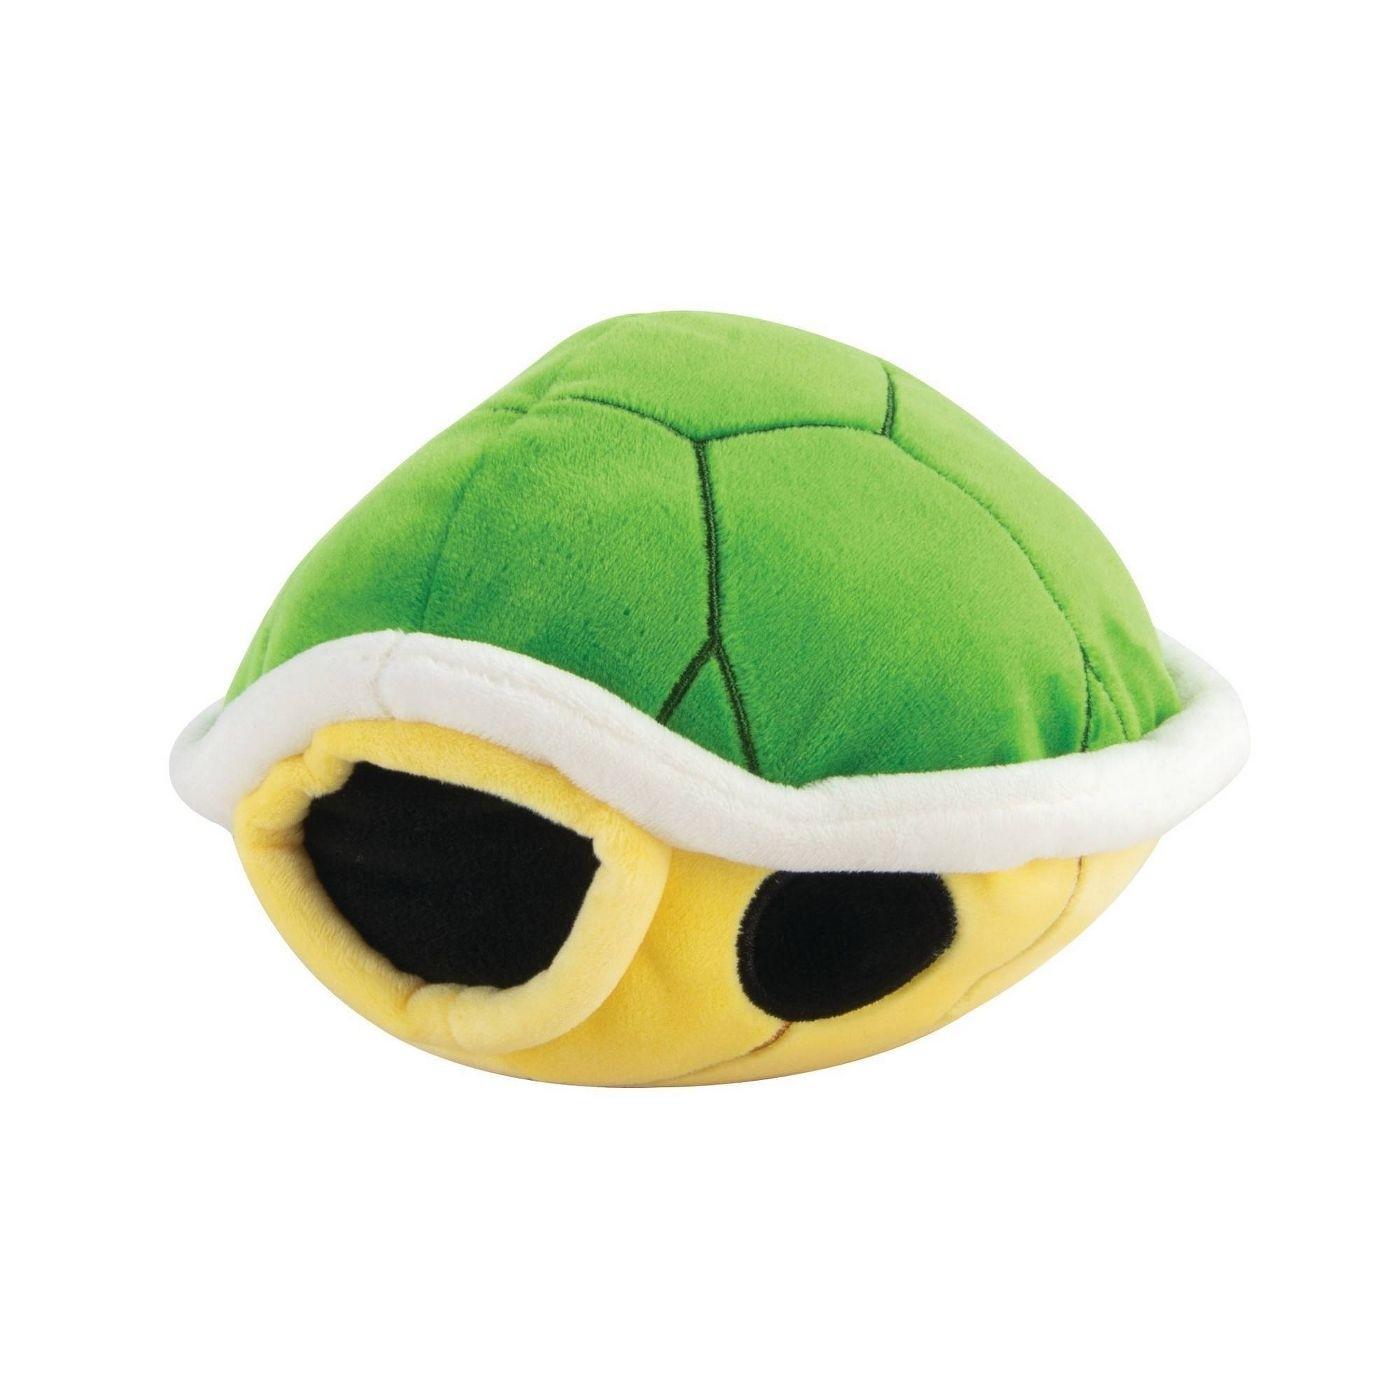 Mocchi-Mocchi Super Mario Green Shell (Junior)